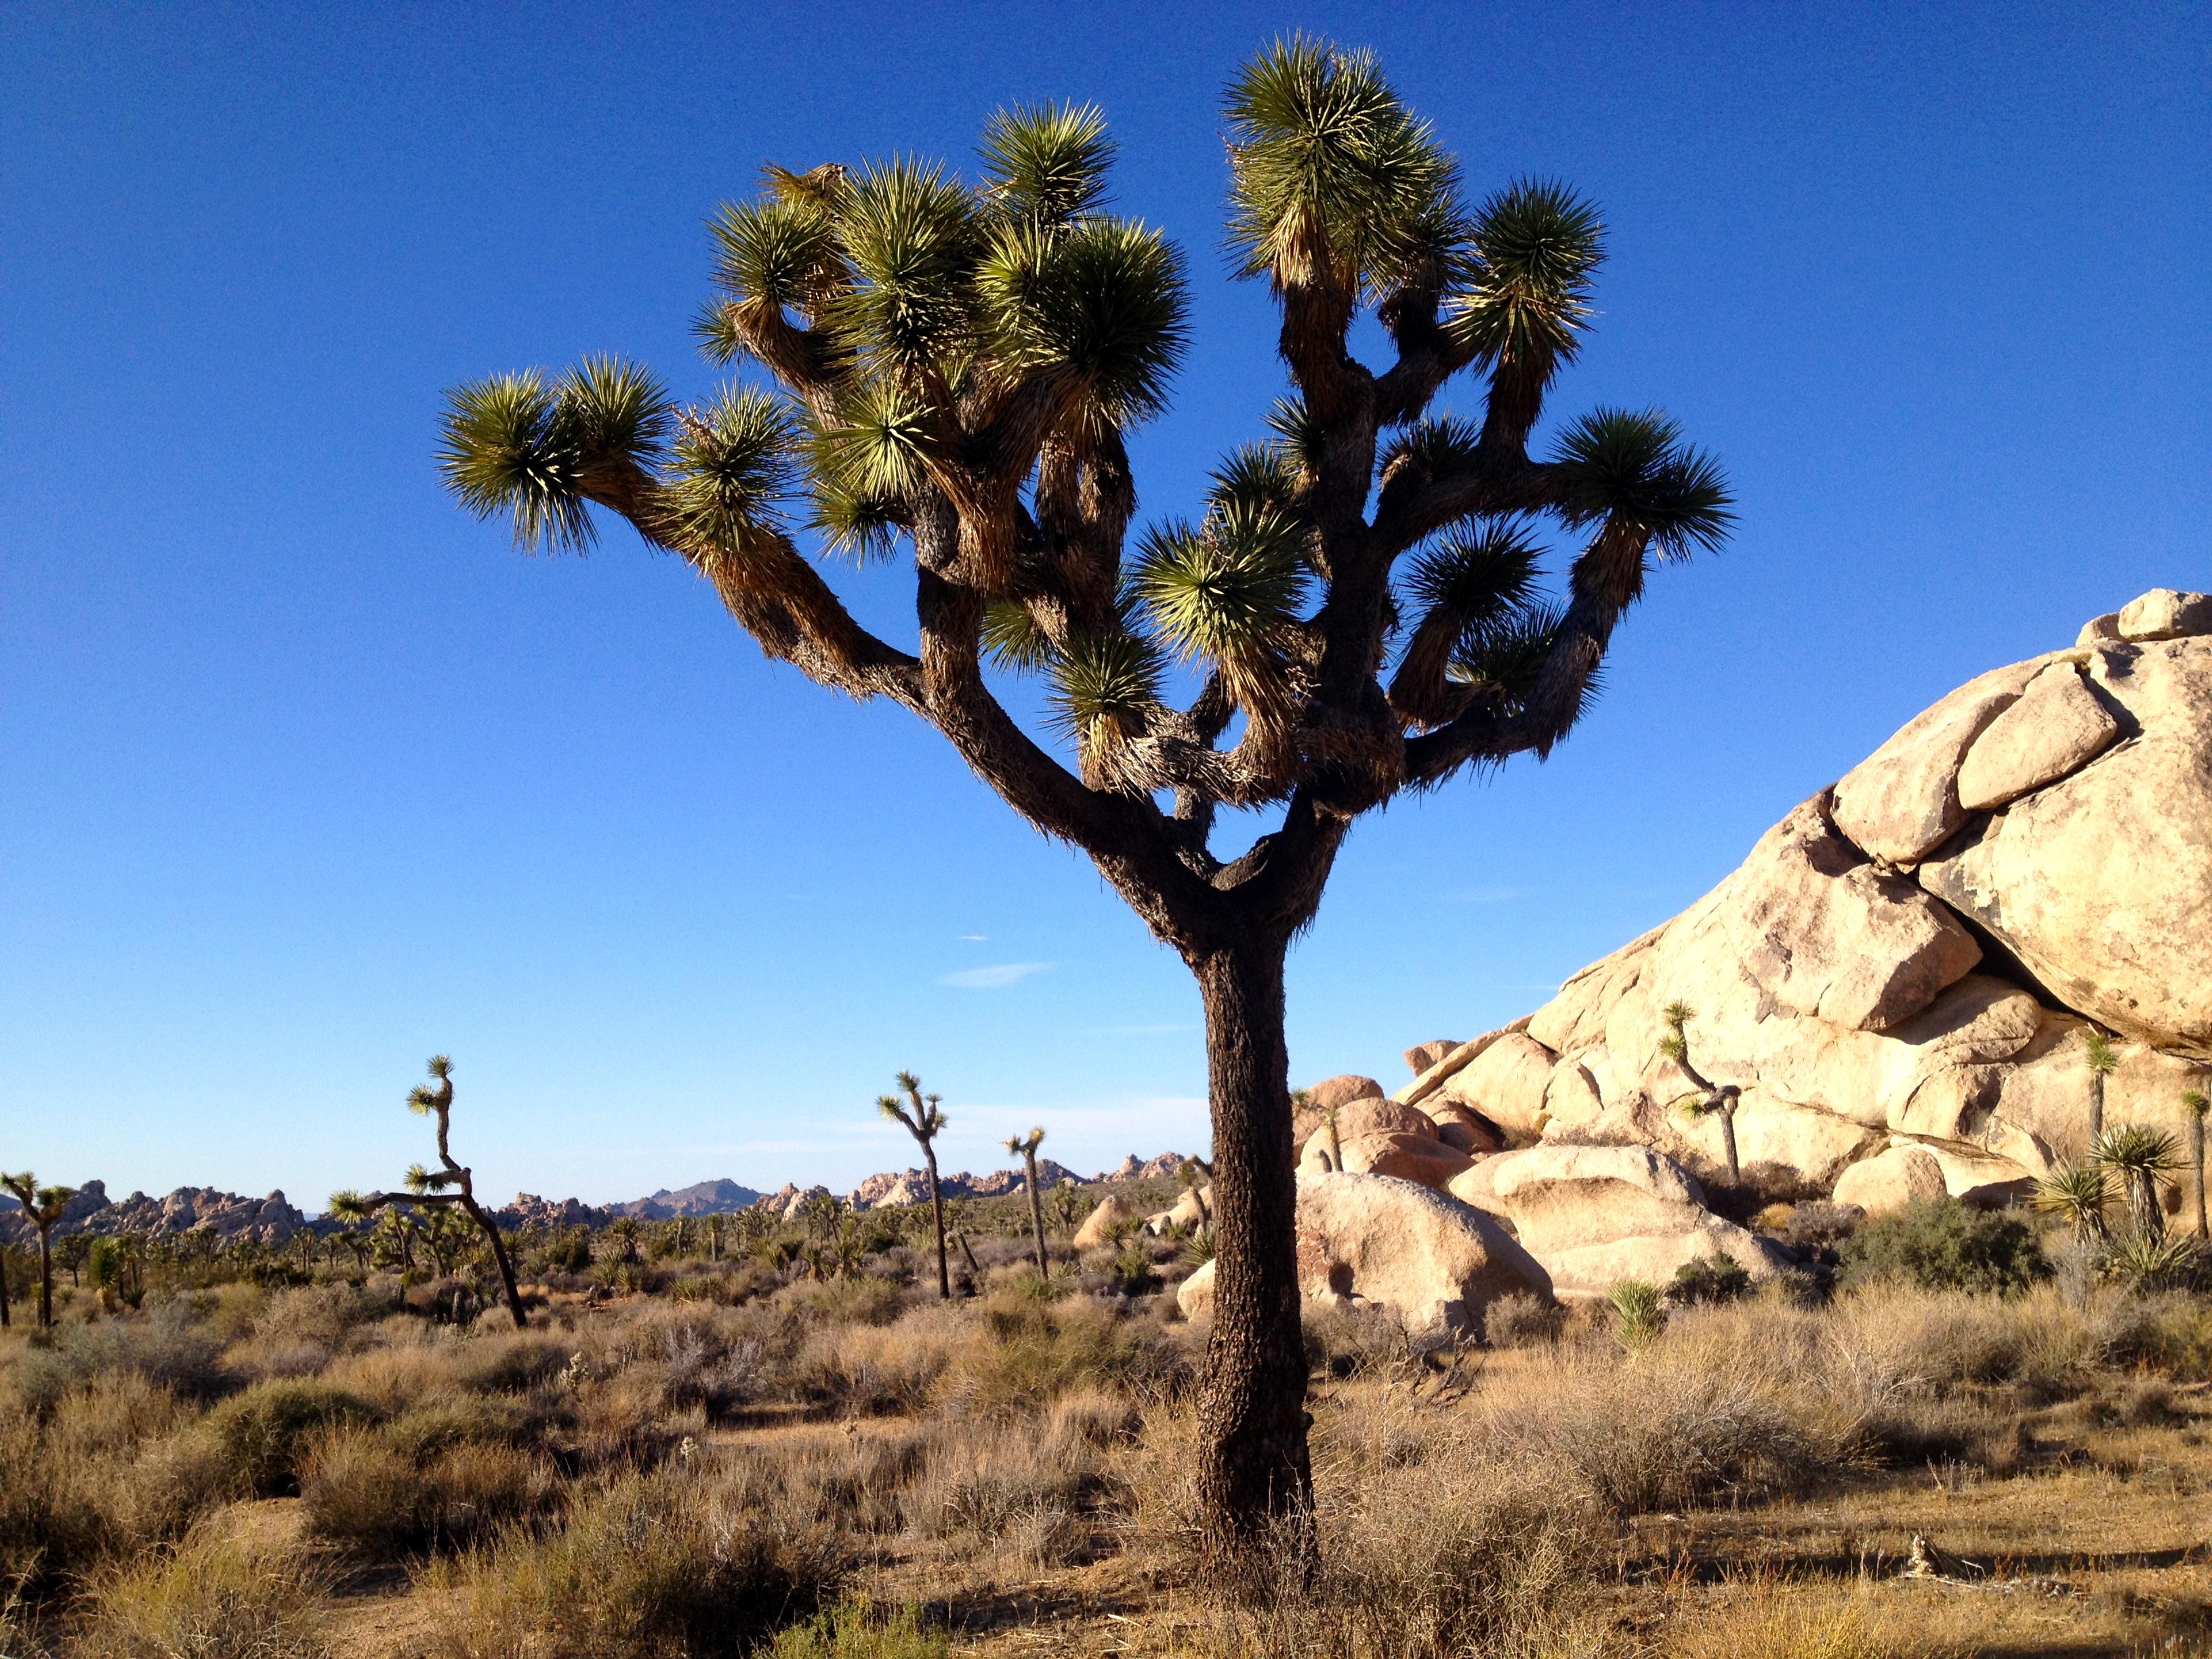 A land of Joshua Trees